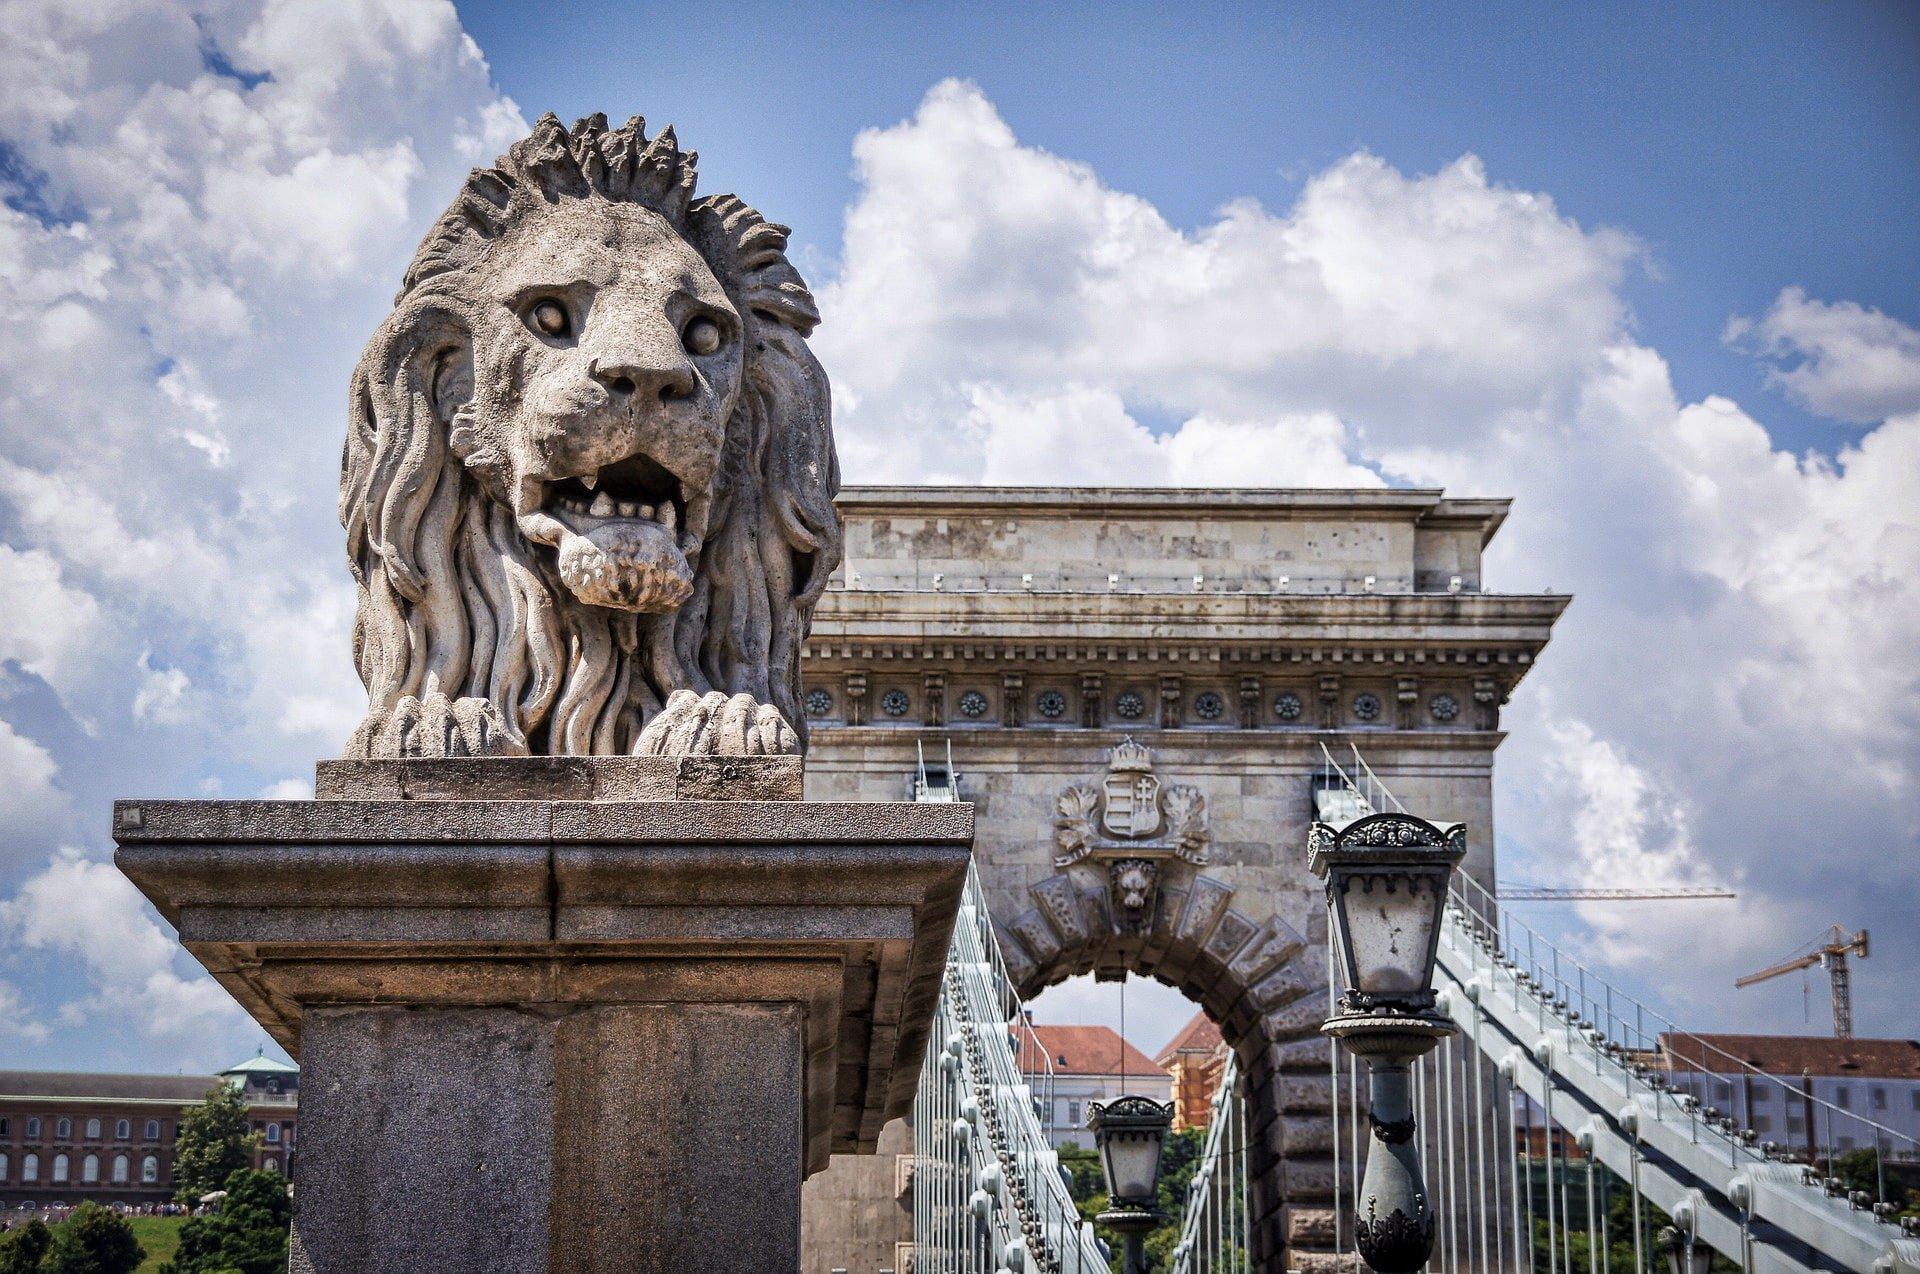 Lion statue - Széchenyi Chain Bridge - Budapest